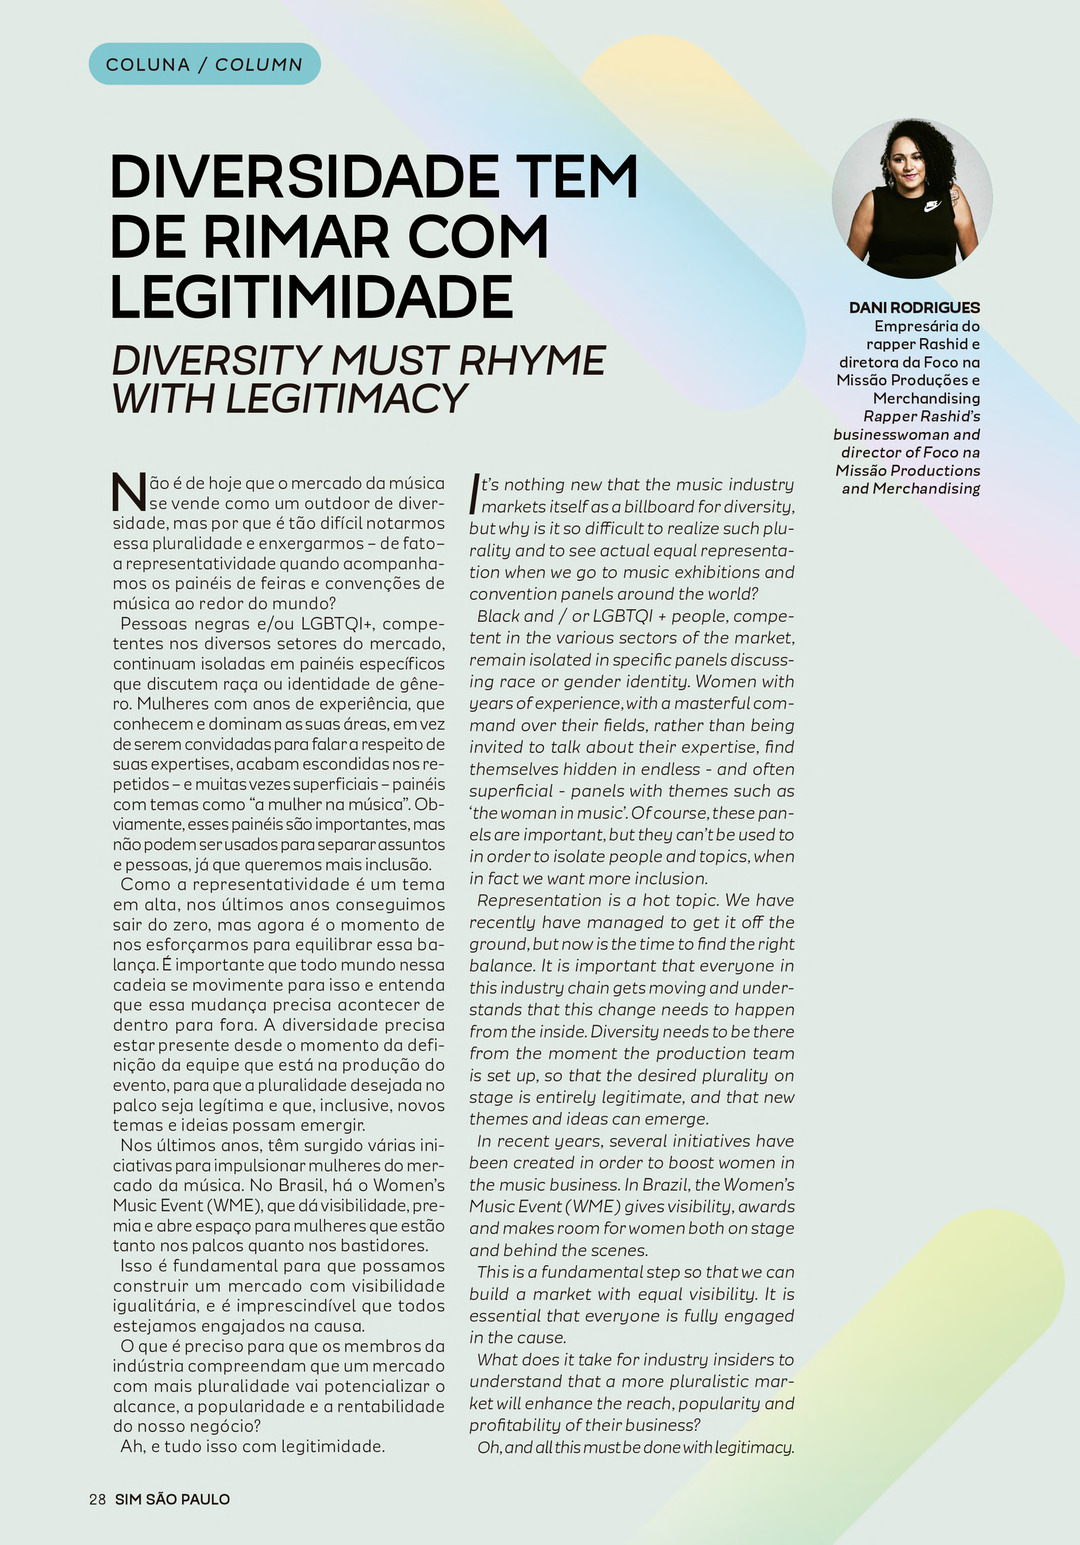 Page 28 of Coluna: Dani Rodrigues